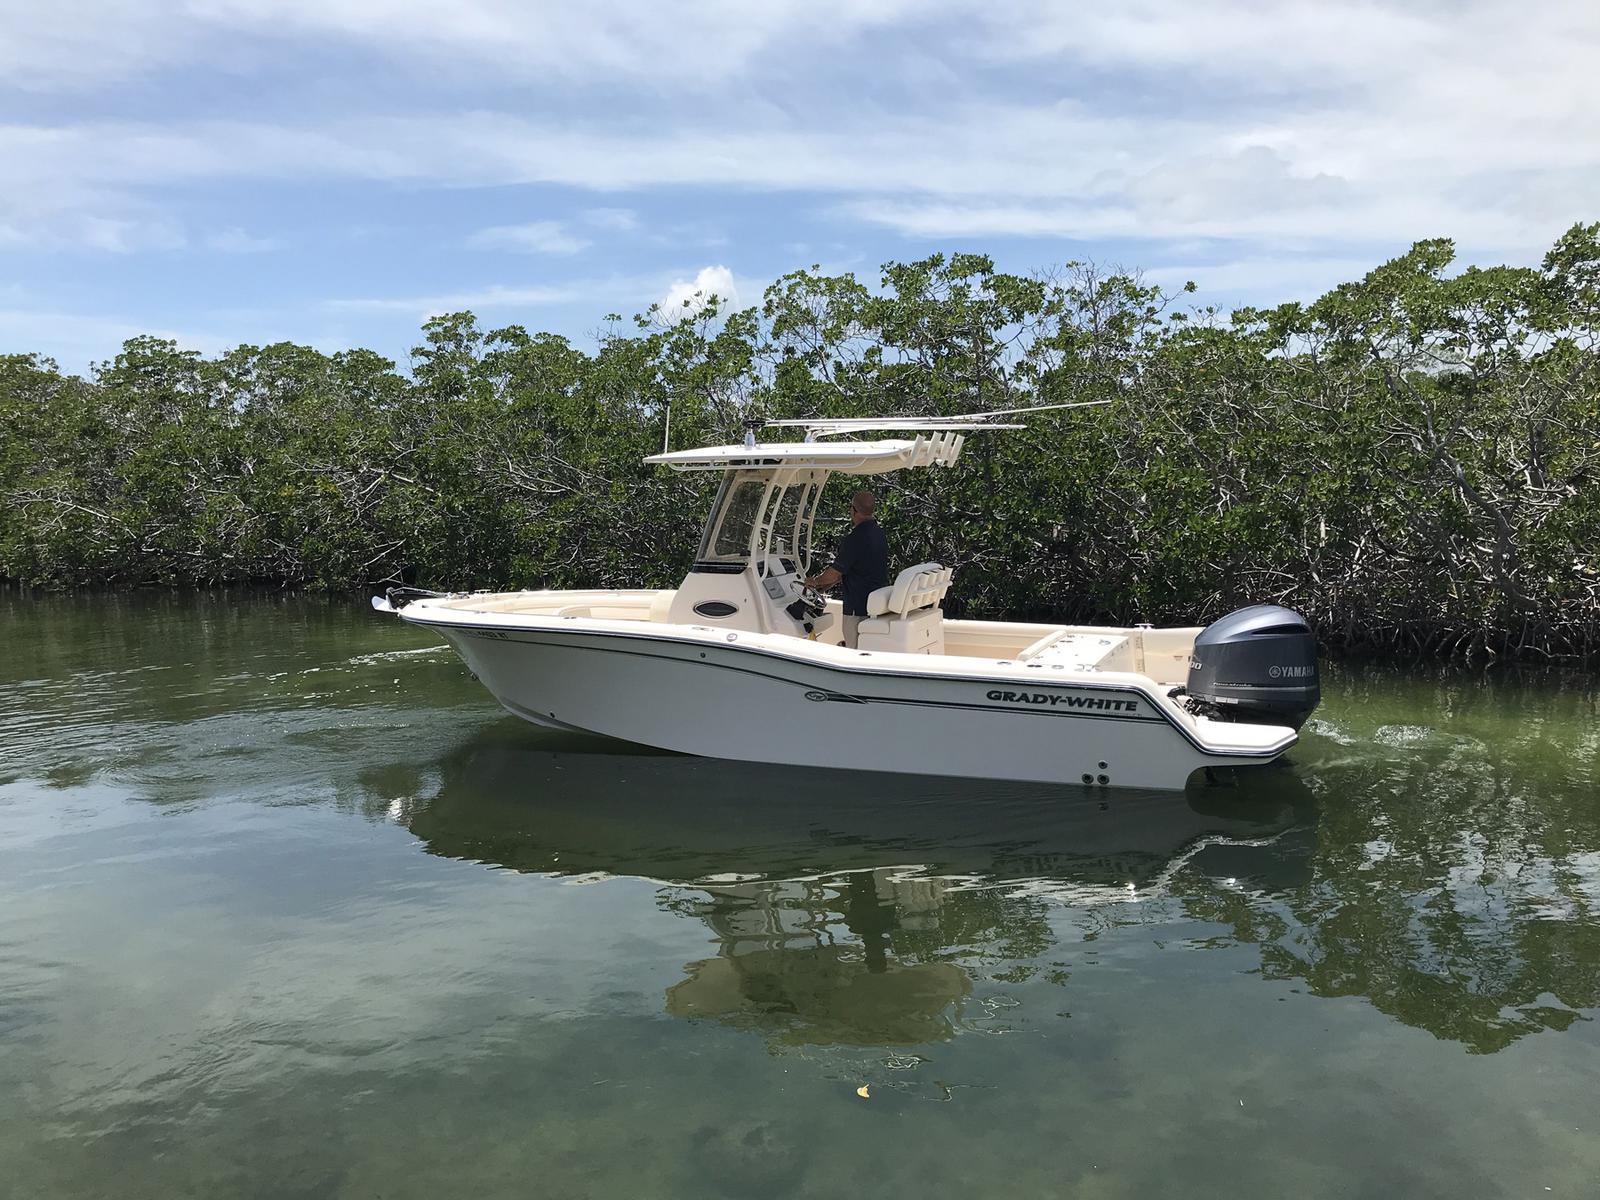 2019 Grady-White Fisherman 236 for sale in Islamorada, FL